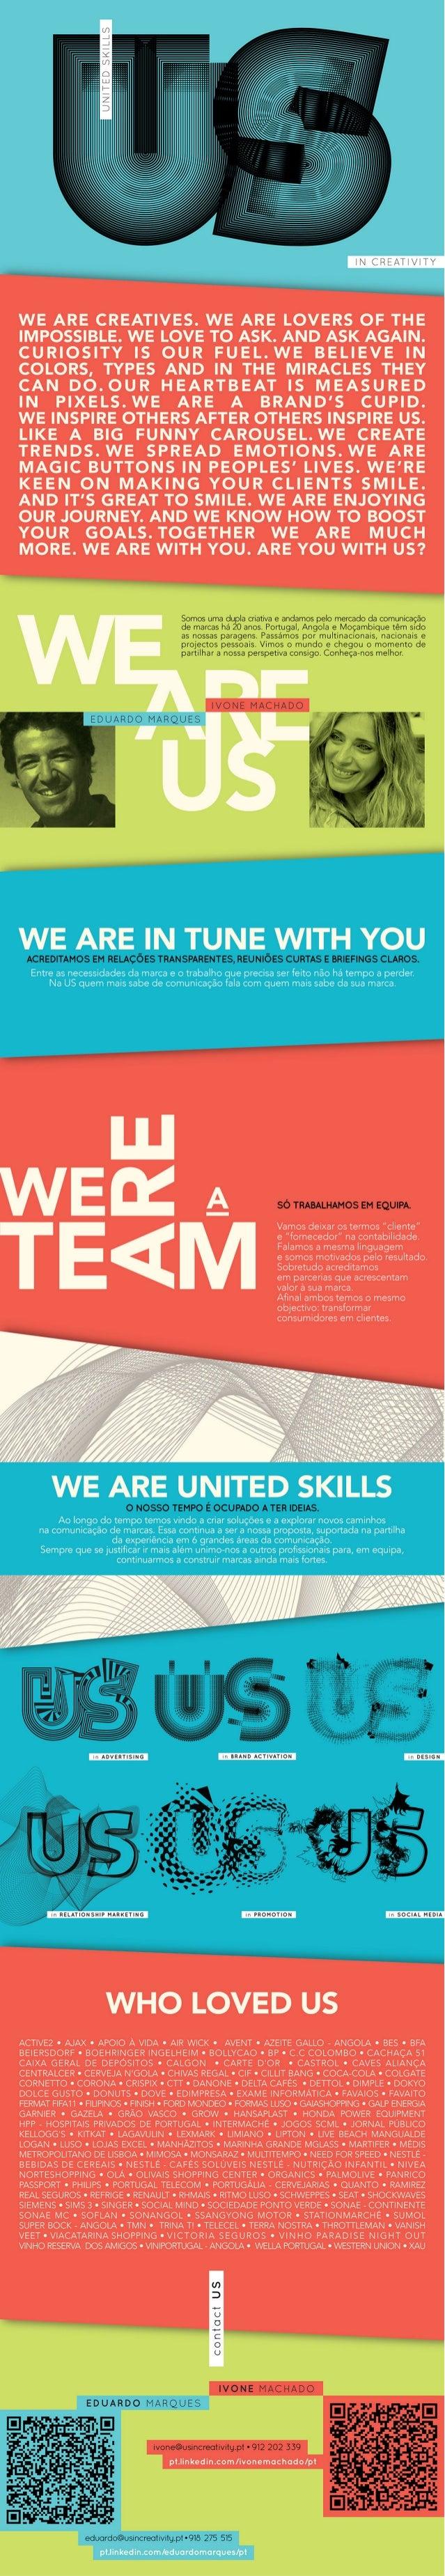 We Present US